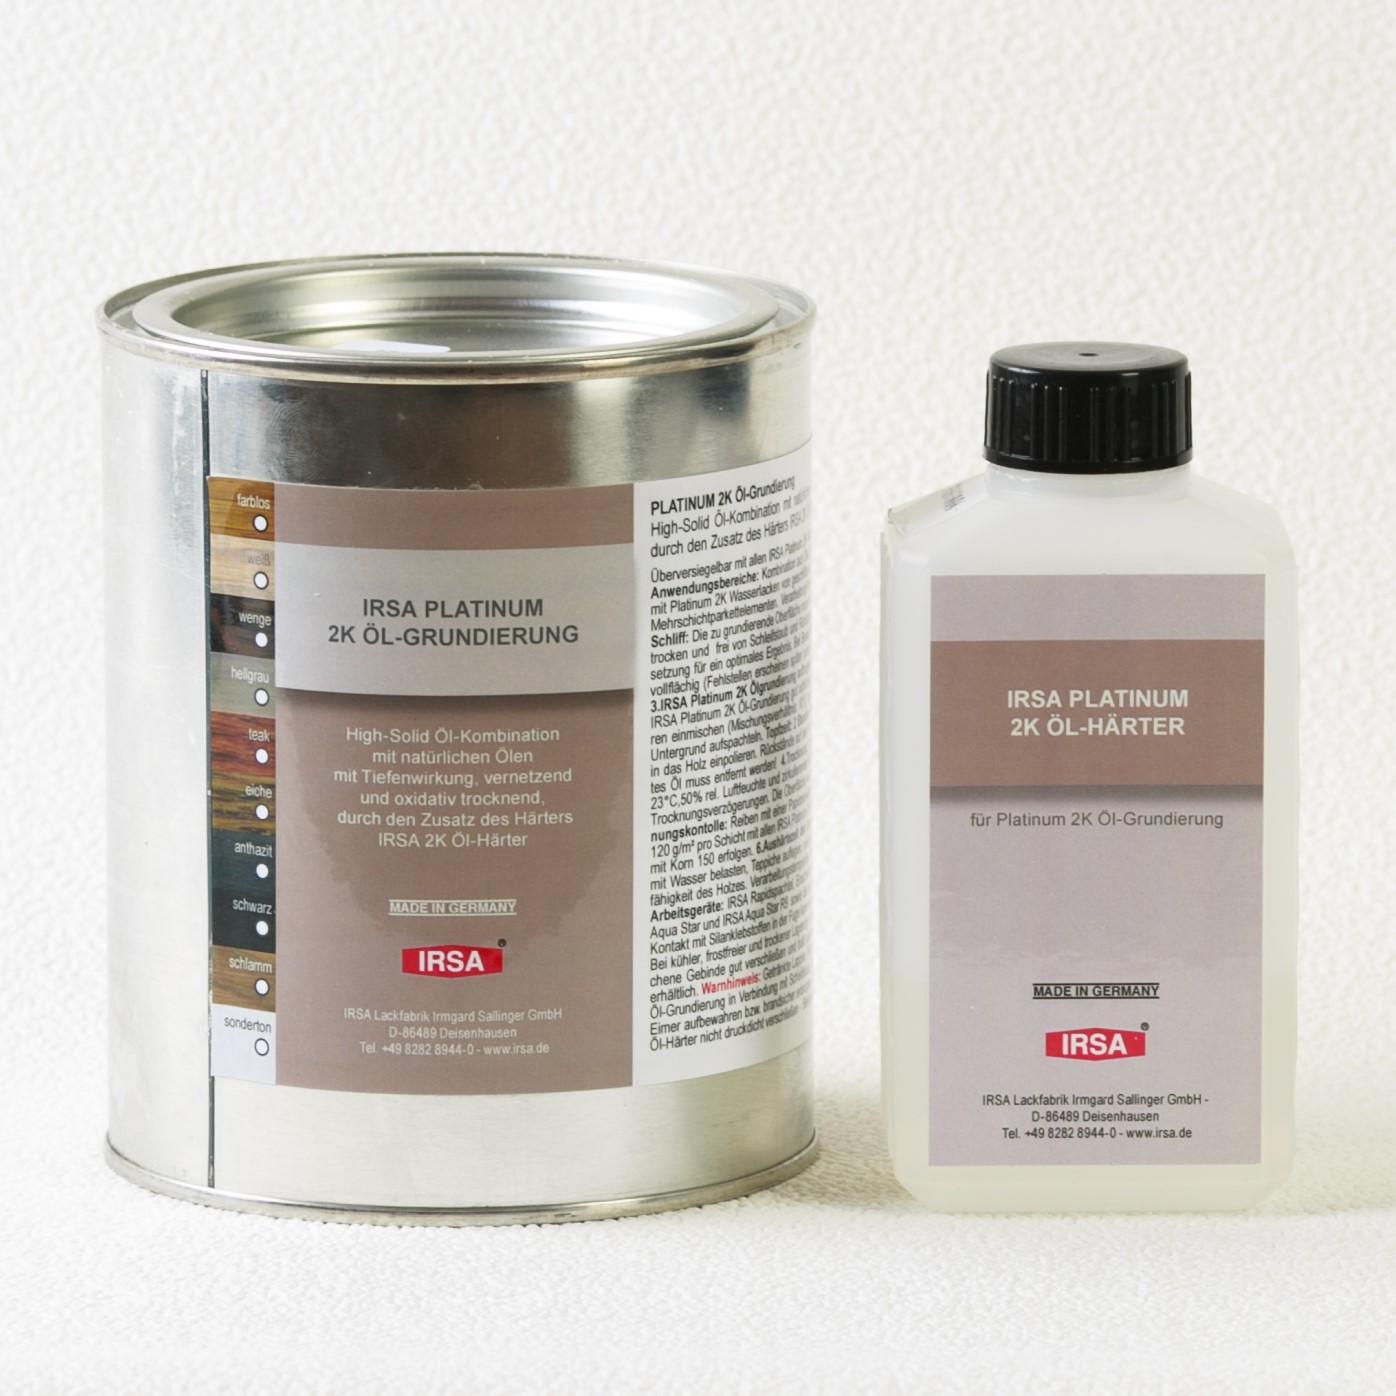 IRSA Platinum 2K Öl-Grundierung двухкомпонентная грунтовка на основе масла